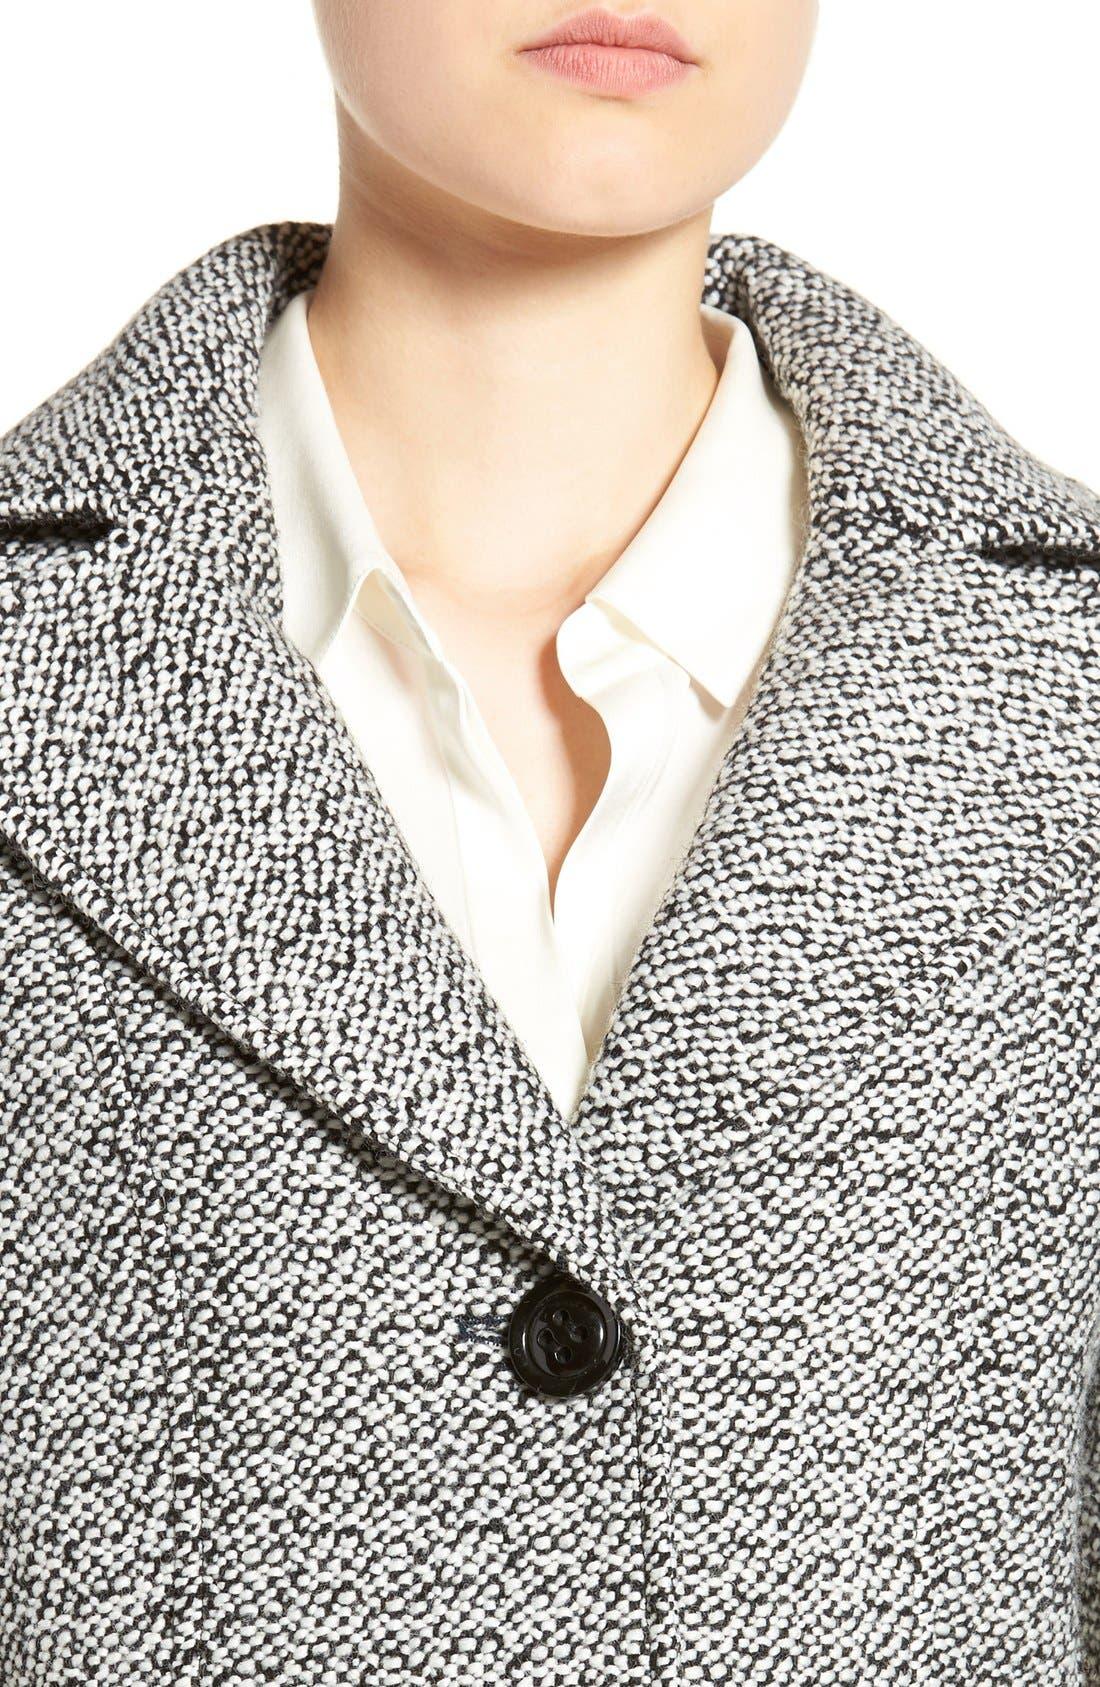 Notch Collar Tweed Coat,                             Alternate thumbnail 4, color,                             White/ Black